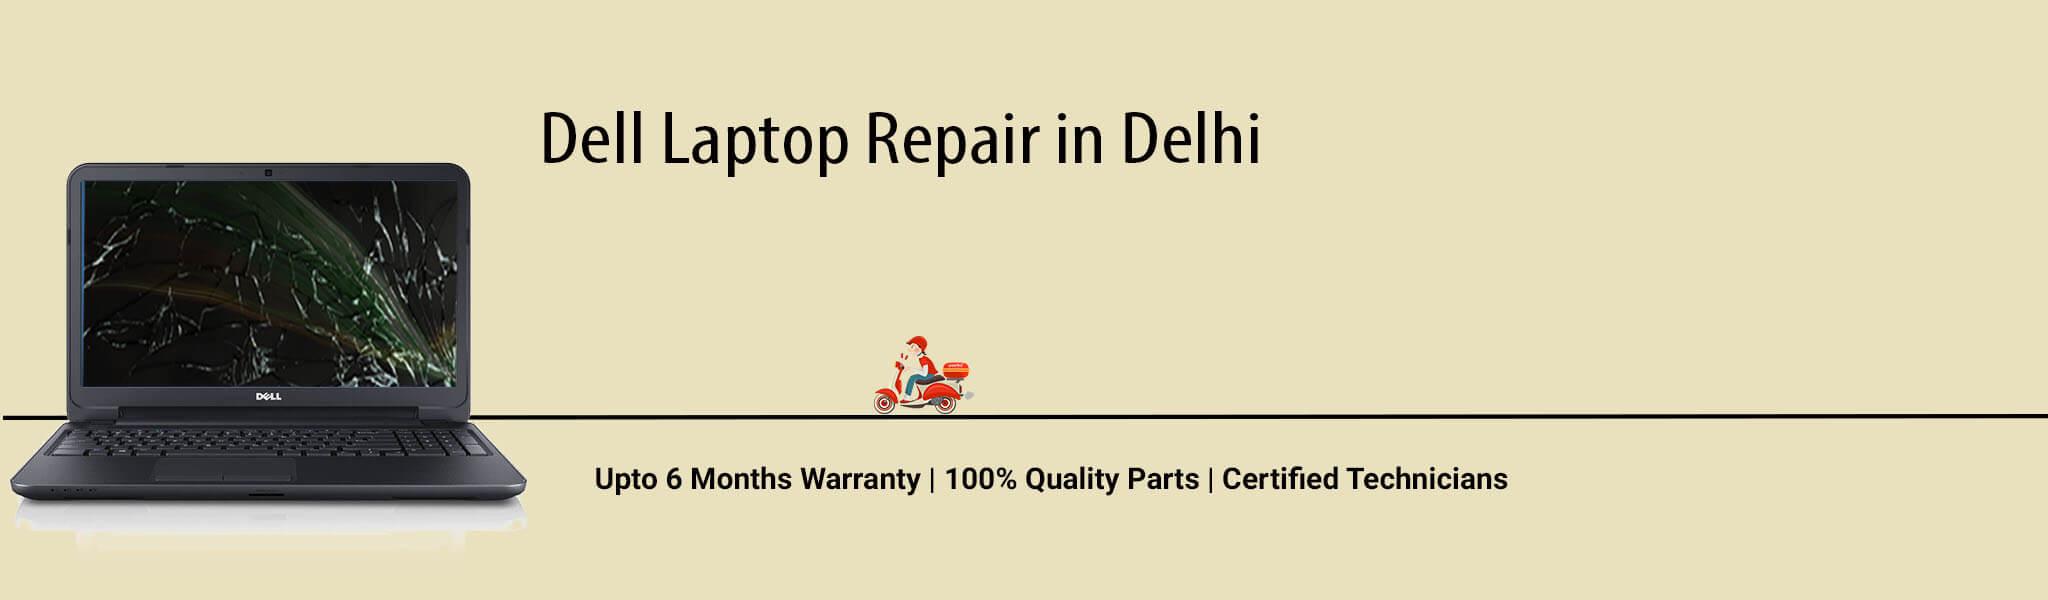 Dell-laptop-banner-delhi.jpg